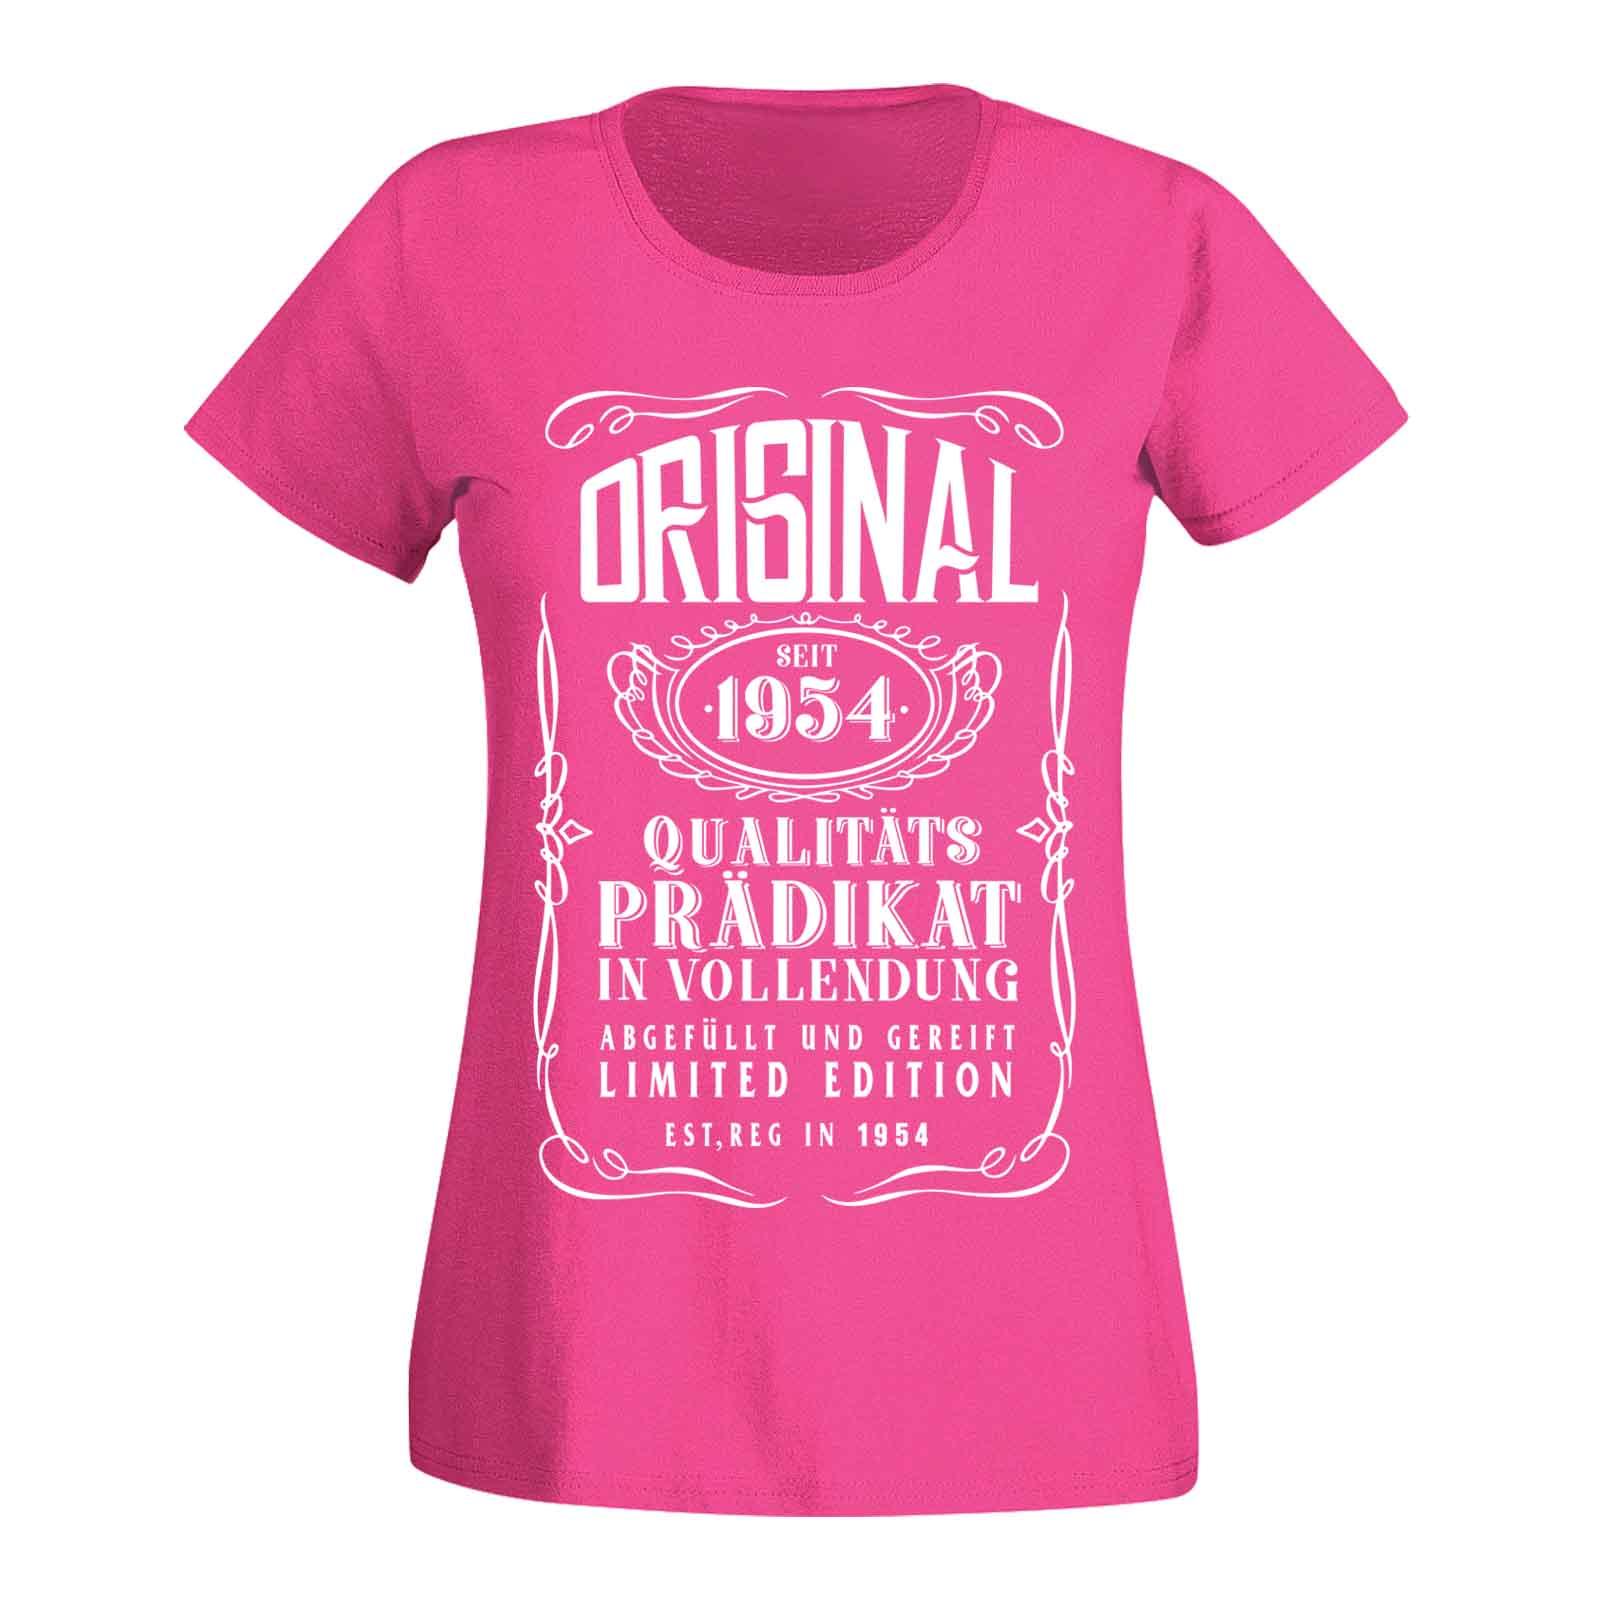 Full Size of Lustige T Shirt Sprüche Lustiges Sprche Shirt Geschenk 63 Jahrgang 1954 T Wandsprüche Coole Männer Junggesellenabschied Wandtattoo Für Die Küche Küche Lustige T Shirt Sprüche